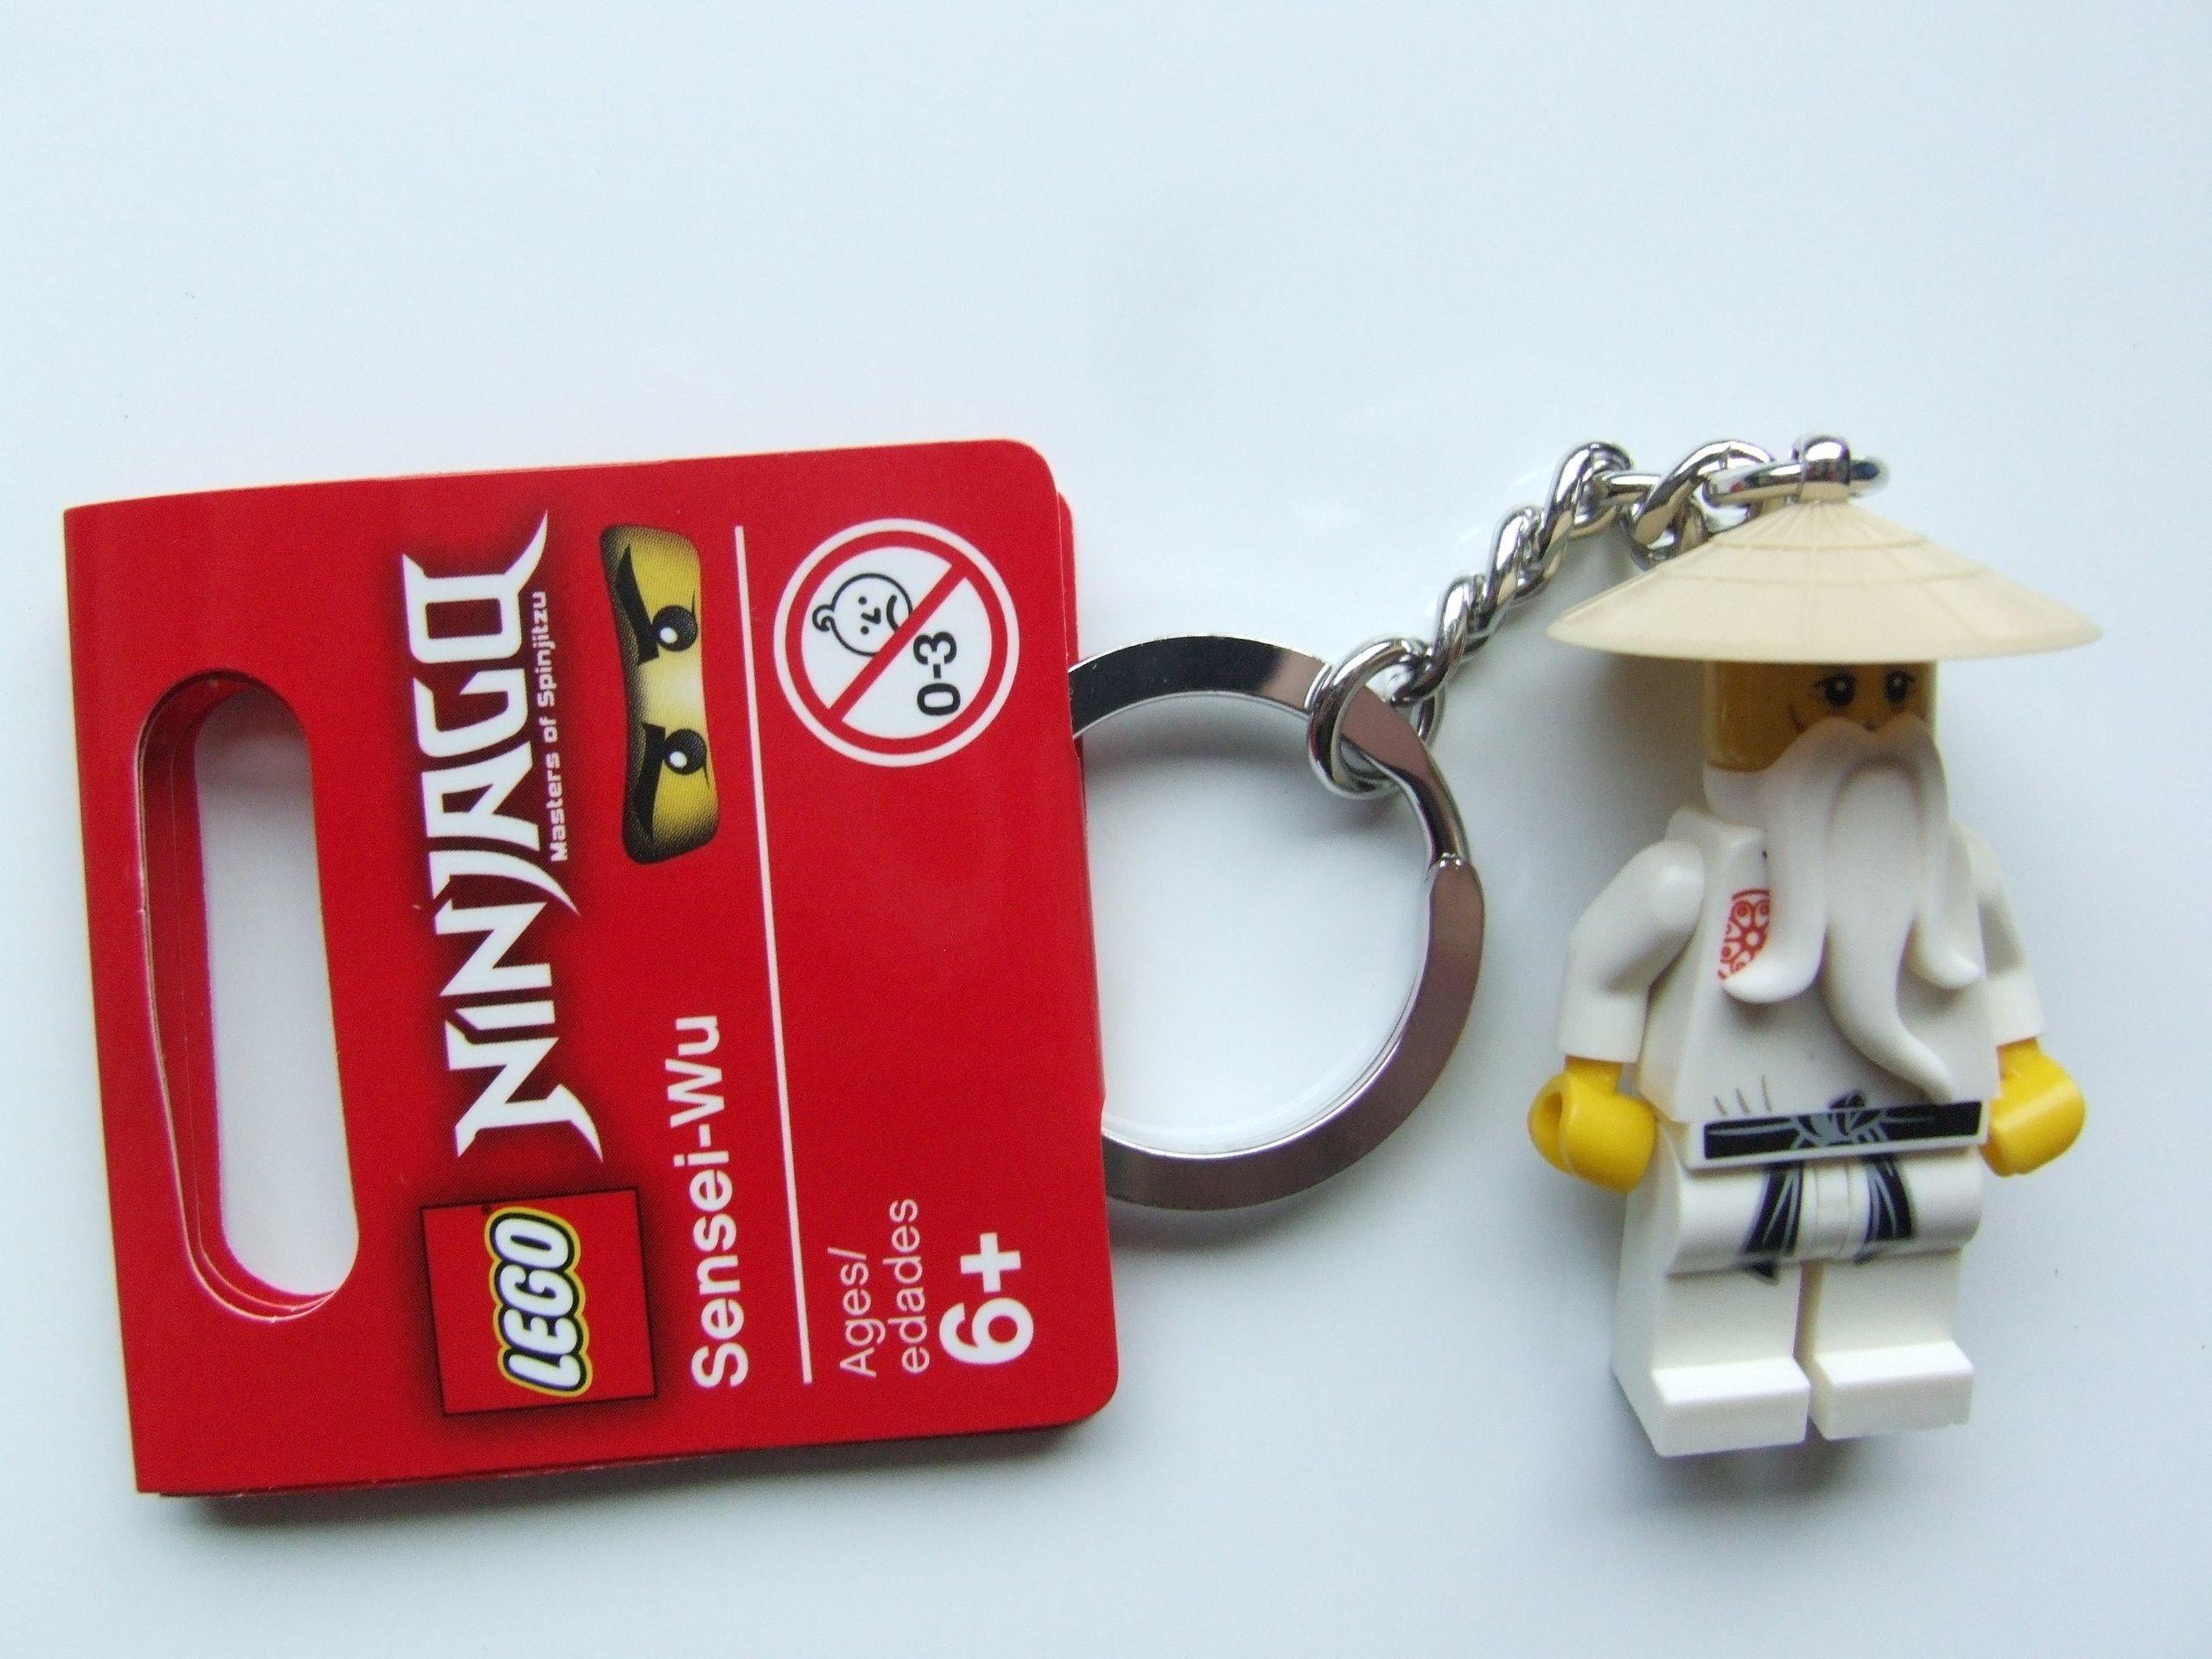 LEGO Ninjago Keychain #853101 Sensei Wu- Buy Online in Burkina Faso at  burkinafaso.desertcart.com. ProductId : 4537824.